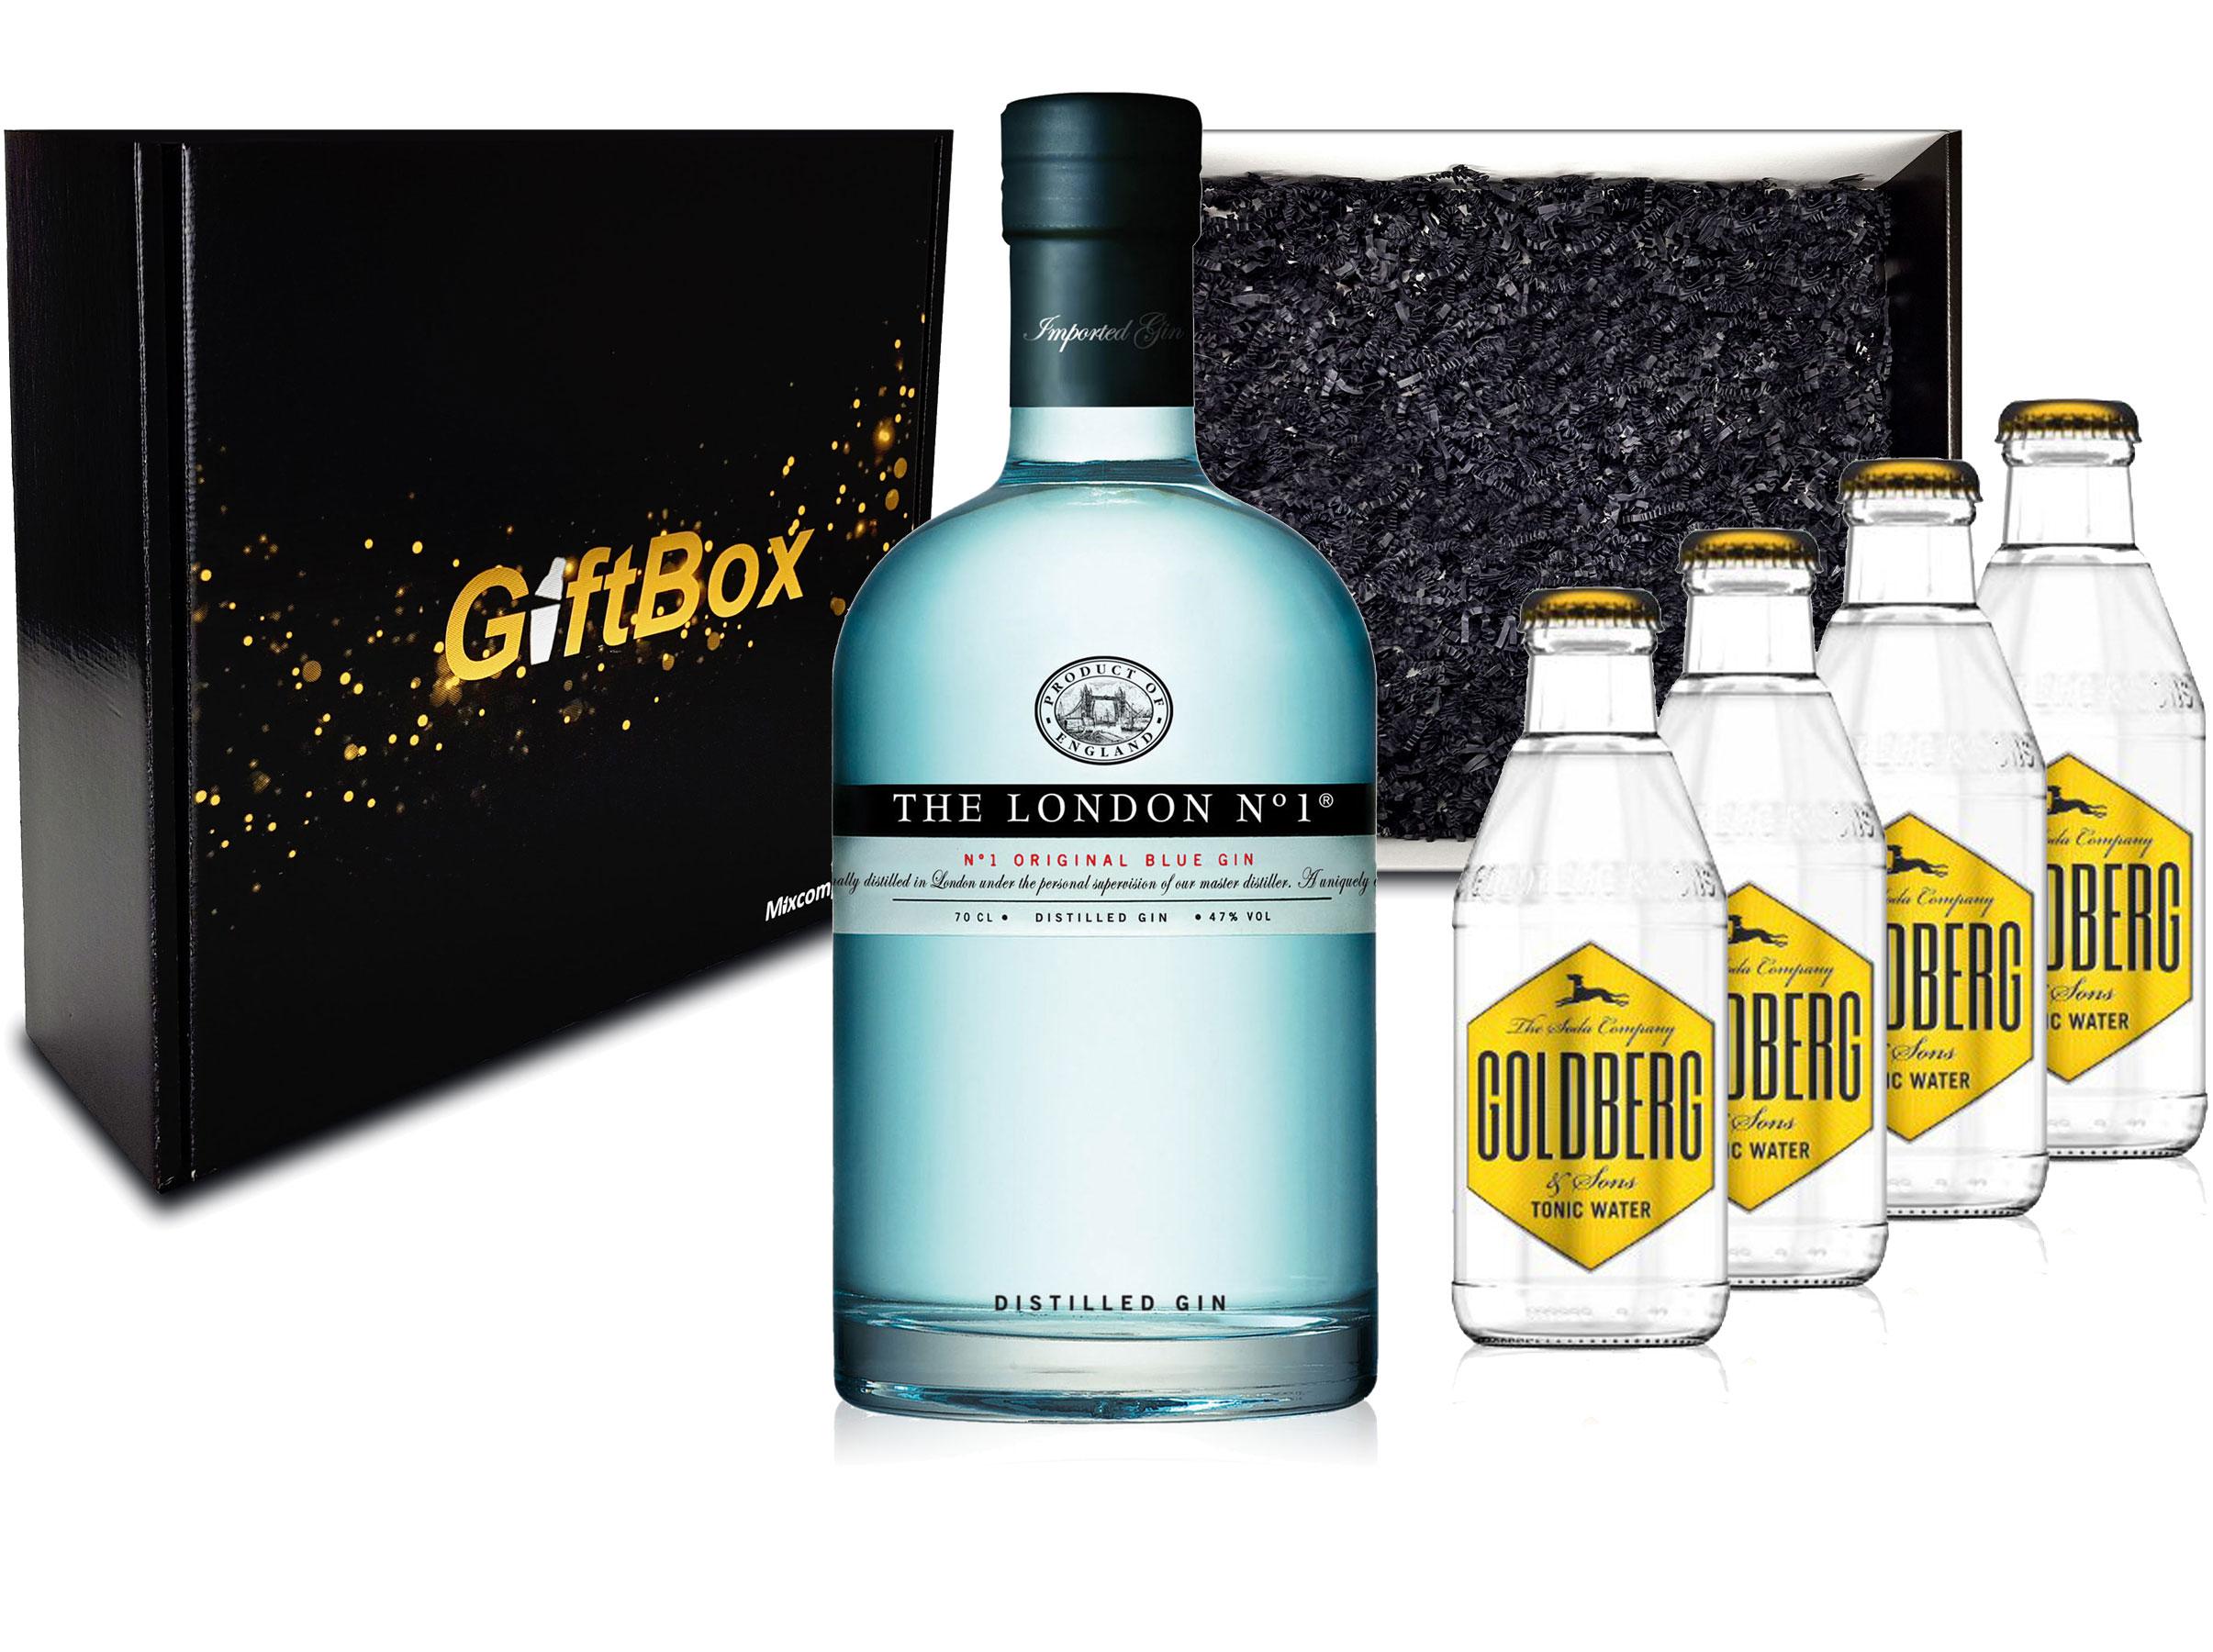 Gin Tonic Giftbox Geschenkset - The London N1 Blue Gin 0,7l 700ml (47% Vol) + 4x Goldberg Tonic Water 200ml inkl. Pfand MEHRWEG + Geschenkverpackung